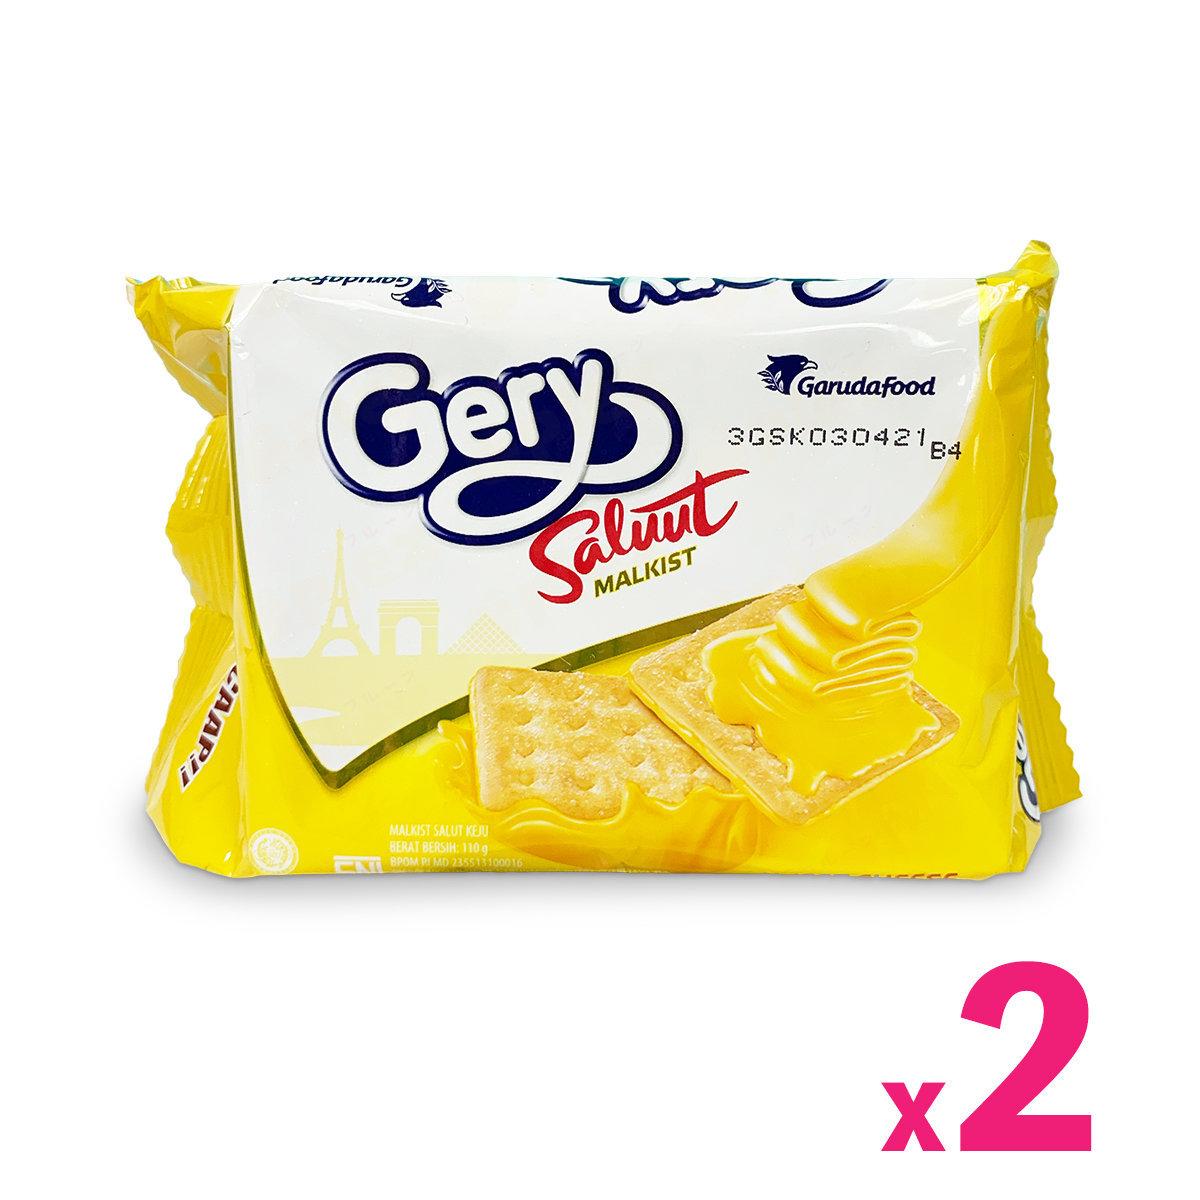 Gery Saluut 厚醬梳打餅 - 芝士味 (110克) x 2包